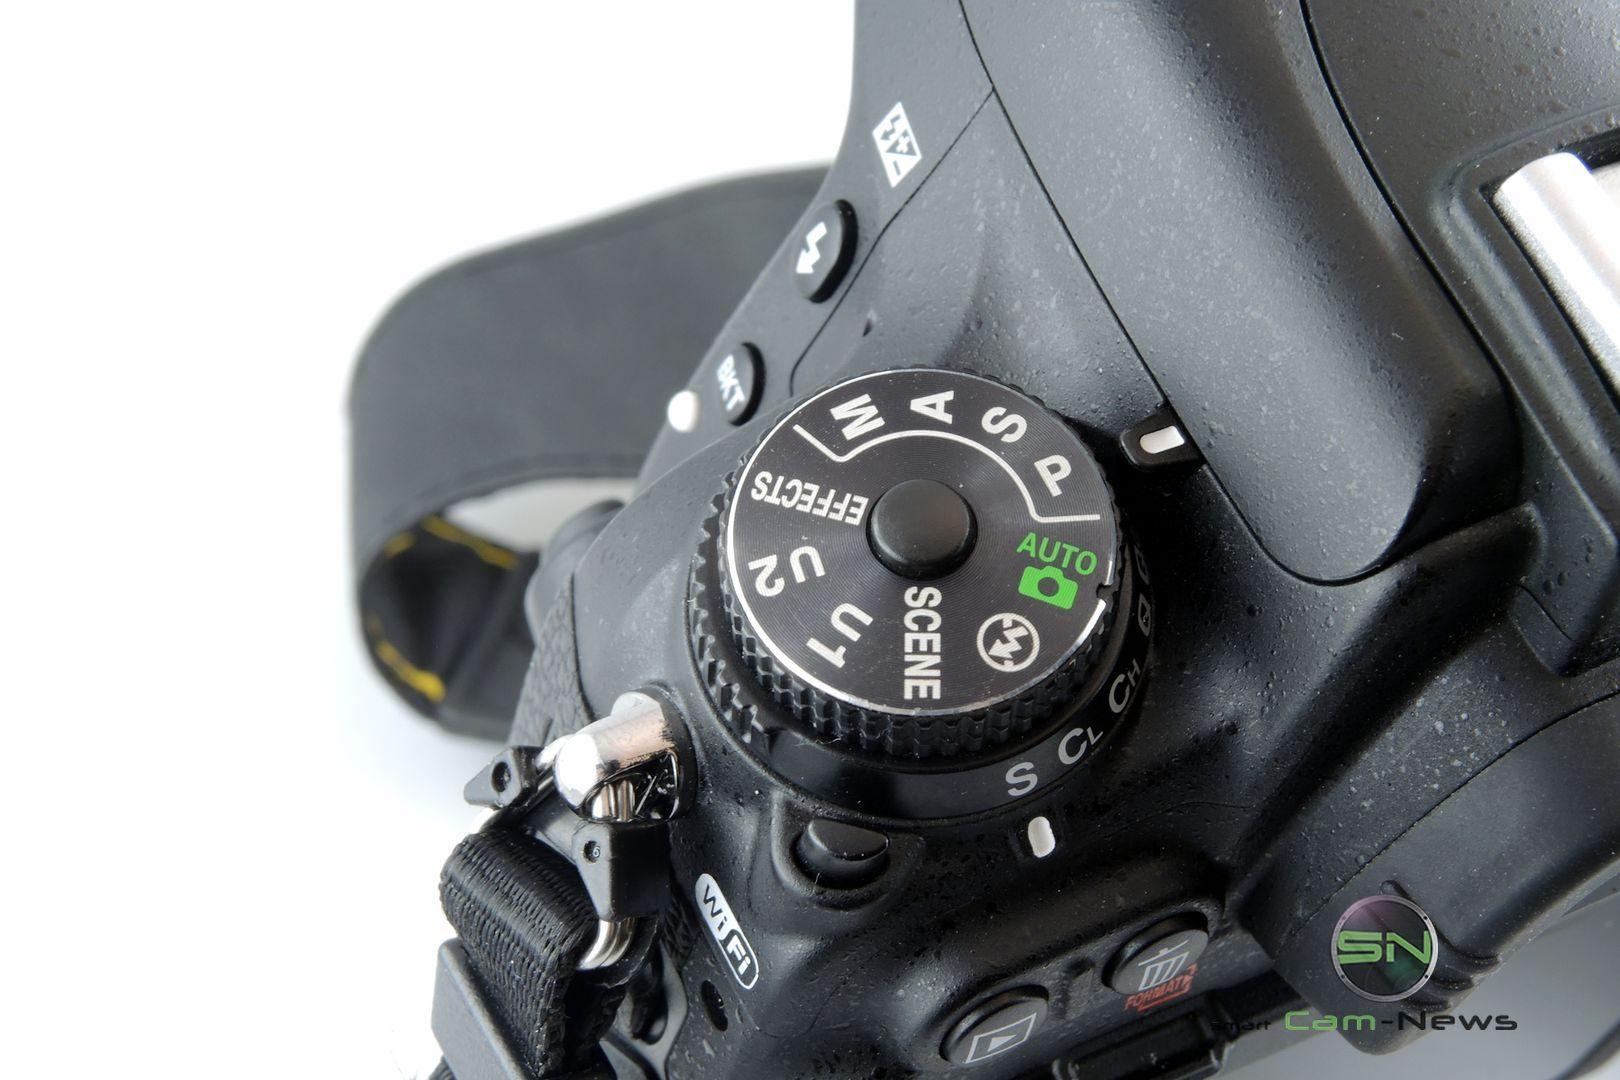 Menü Aufnahmestellrad - Nikon D750 - SmartCamNews